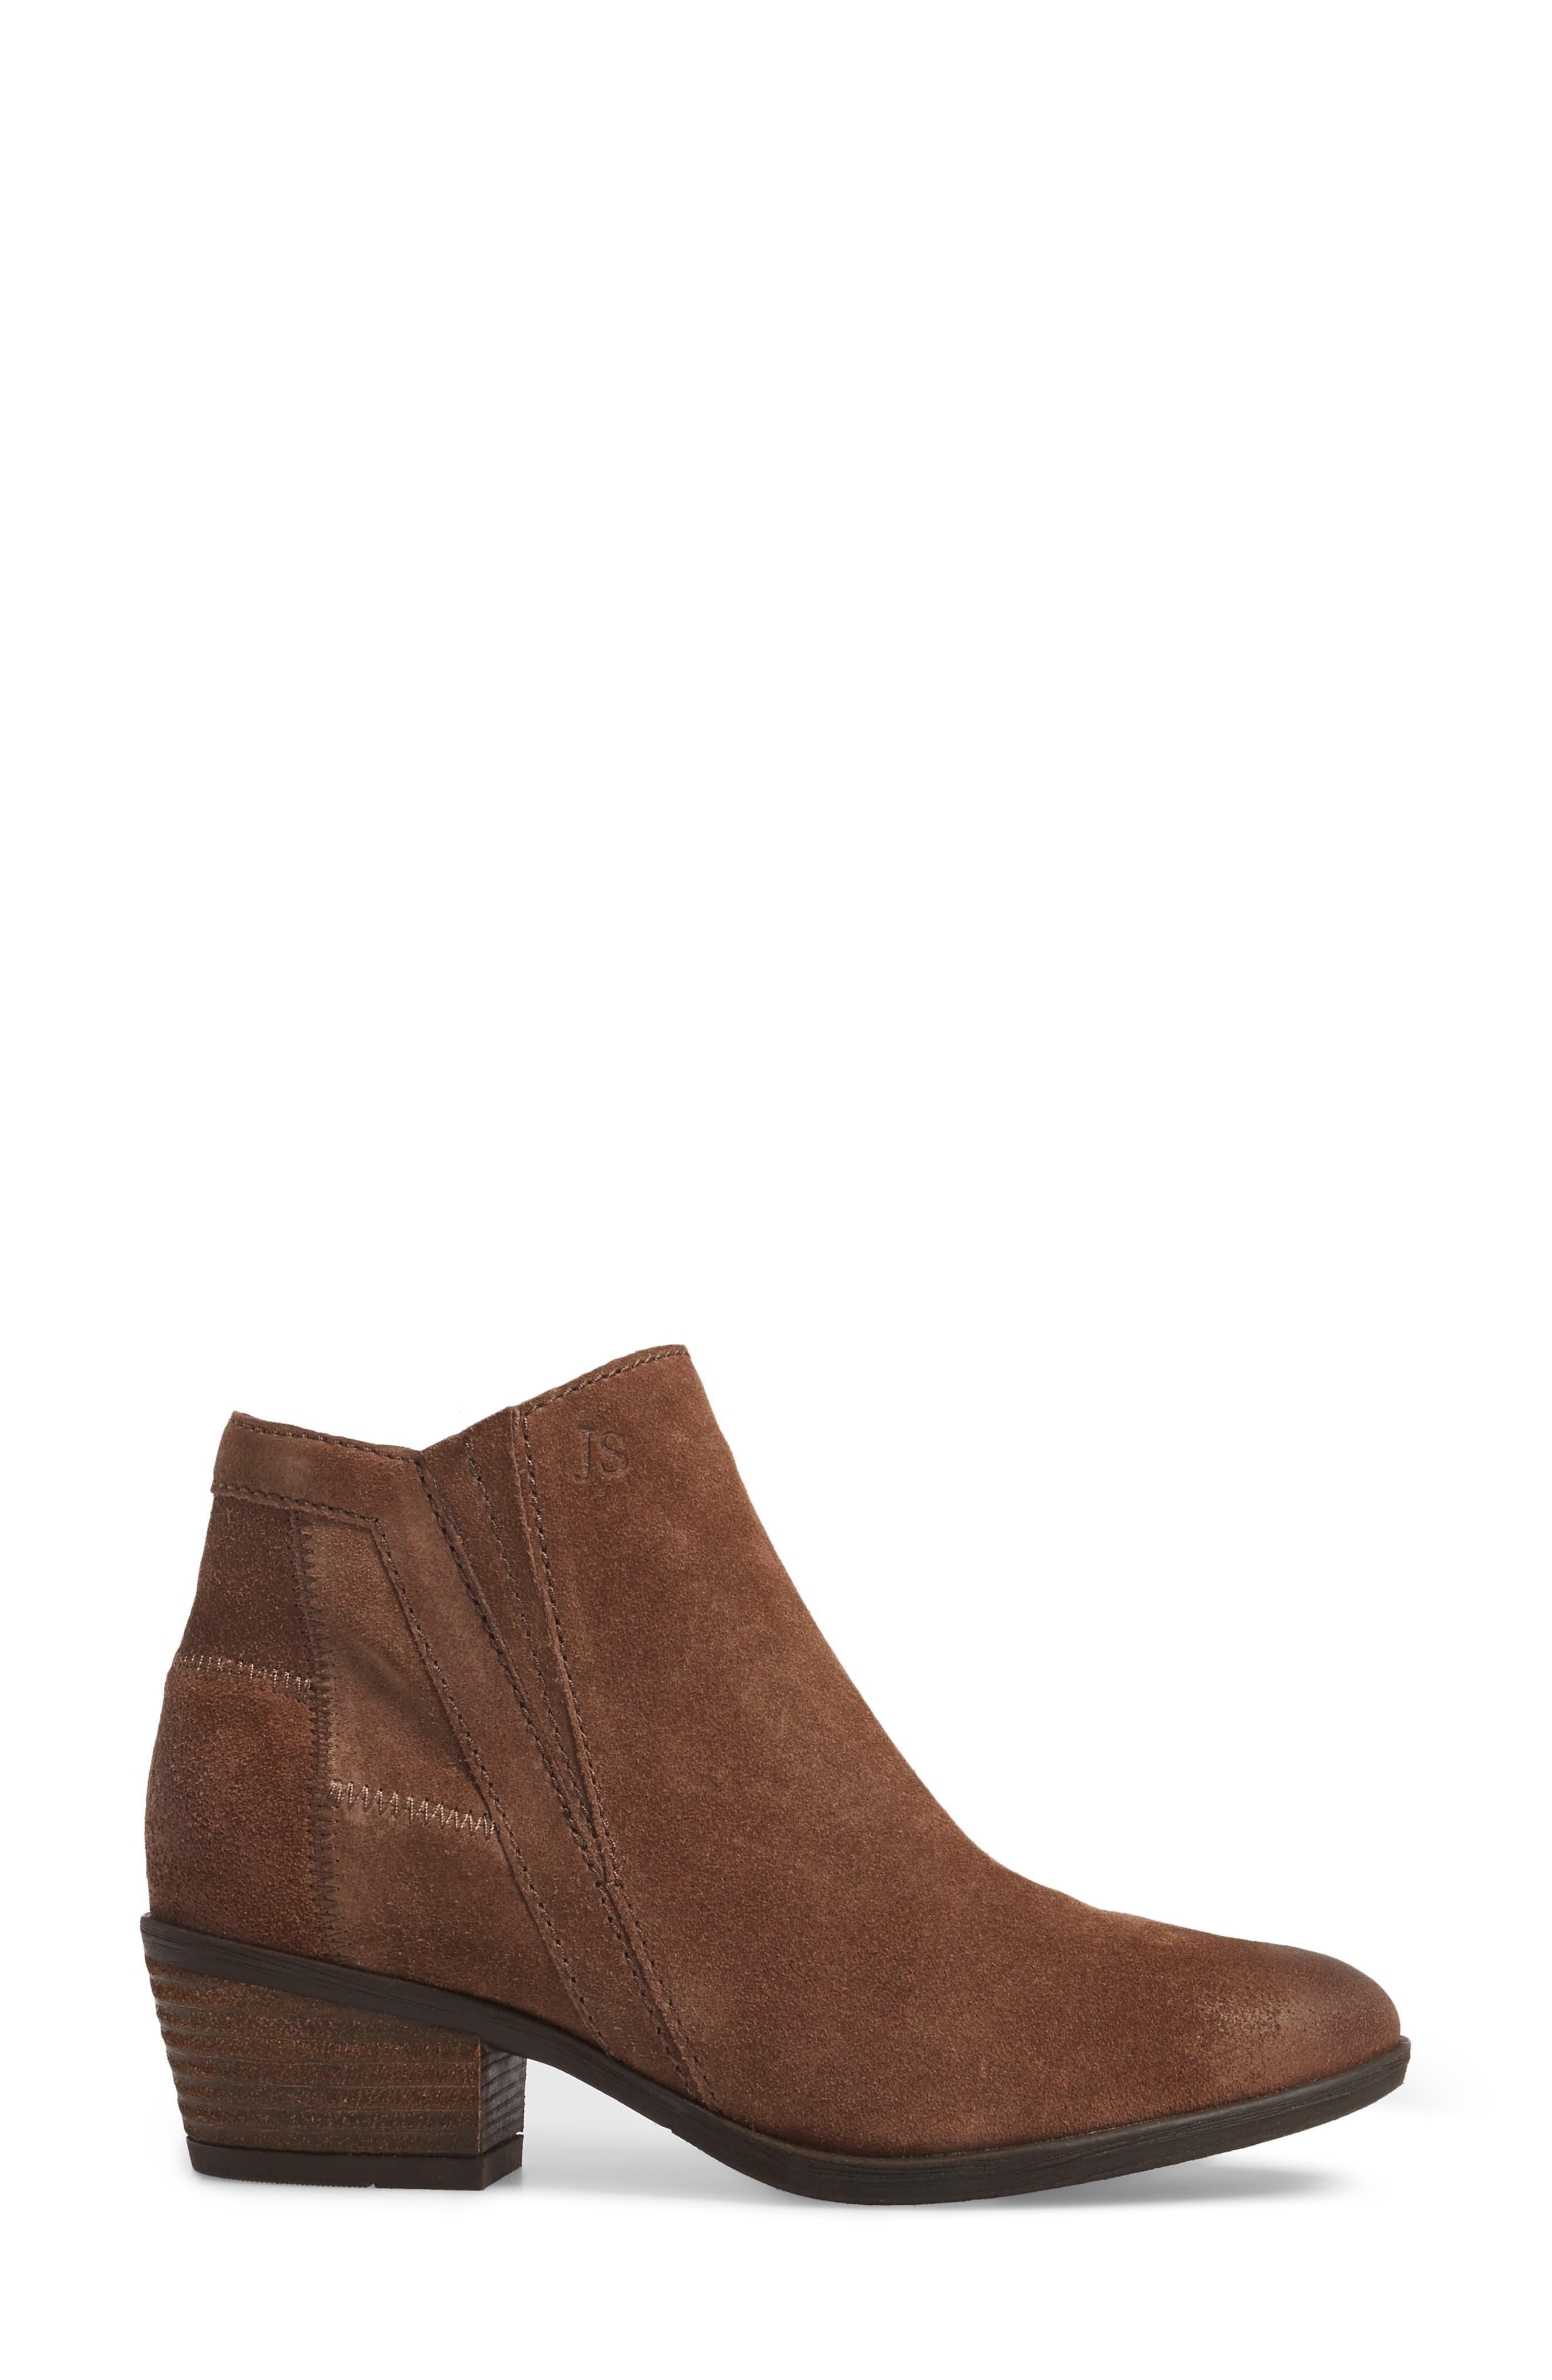 Daphne Bootie,                             Alternate thumbnail 3, color,                             Brown Leather